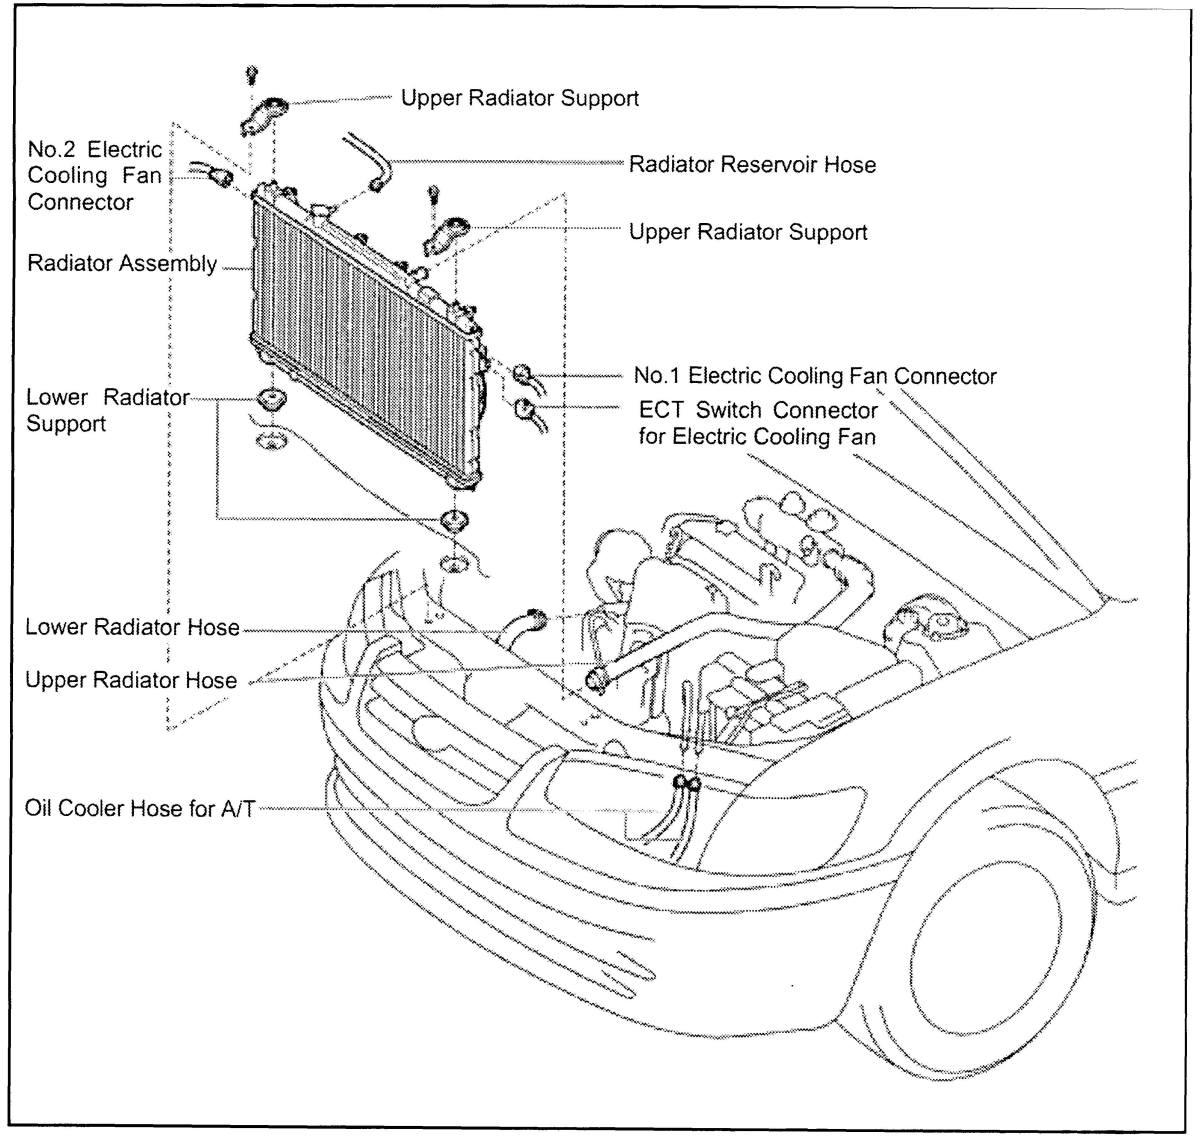 2000 Toyota camry radiator support